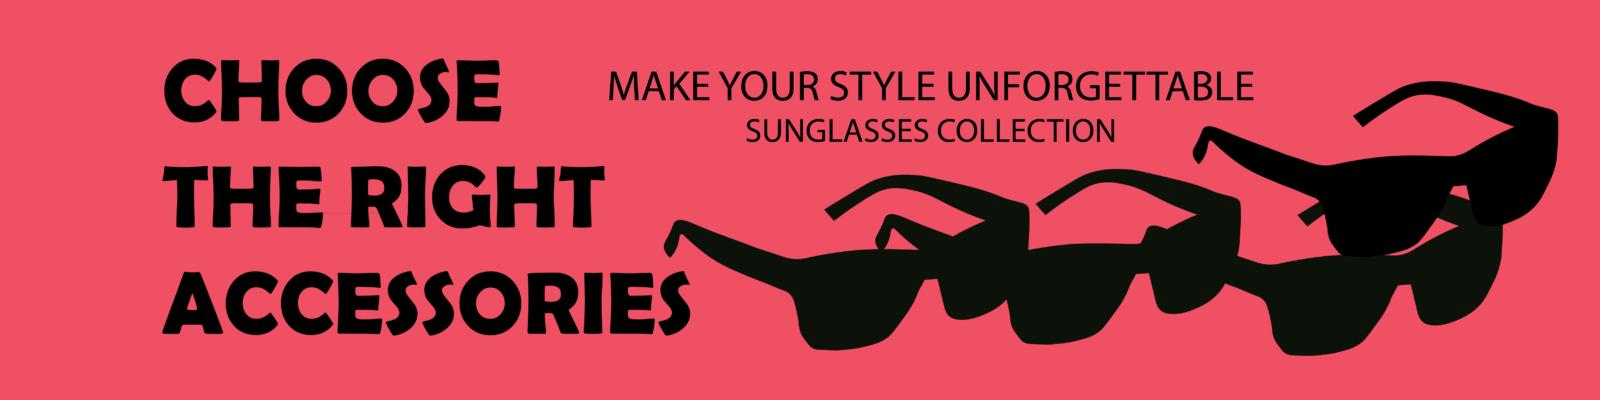 sunglasses_1-01-01